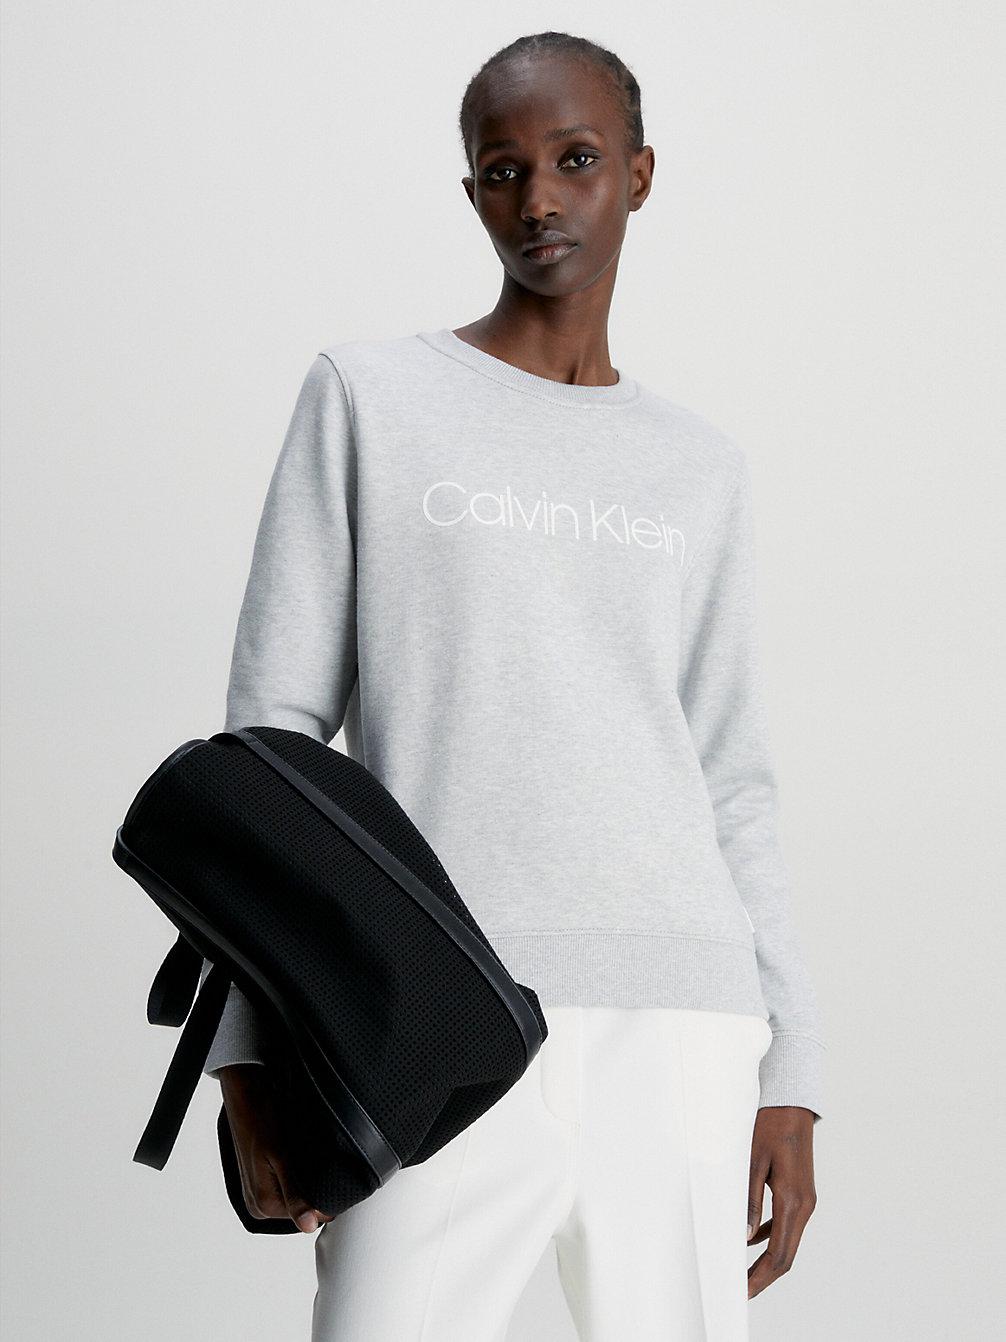 Women's Clothes | Womenswear | Calvin Klein® - Official Site